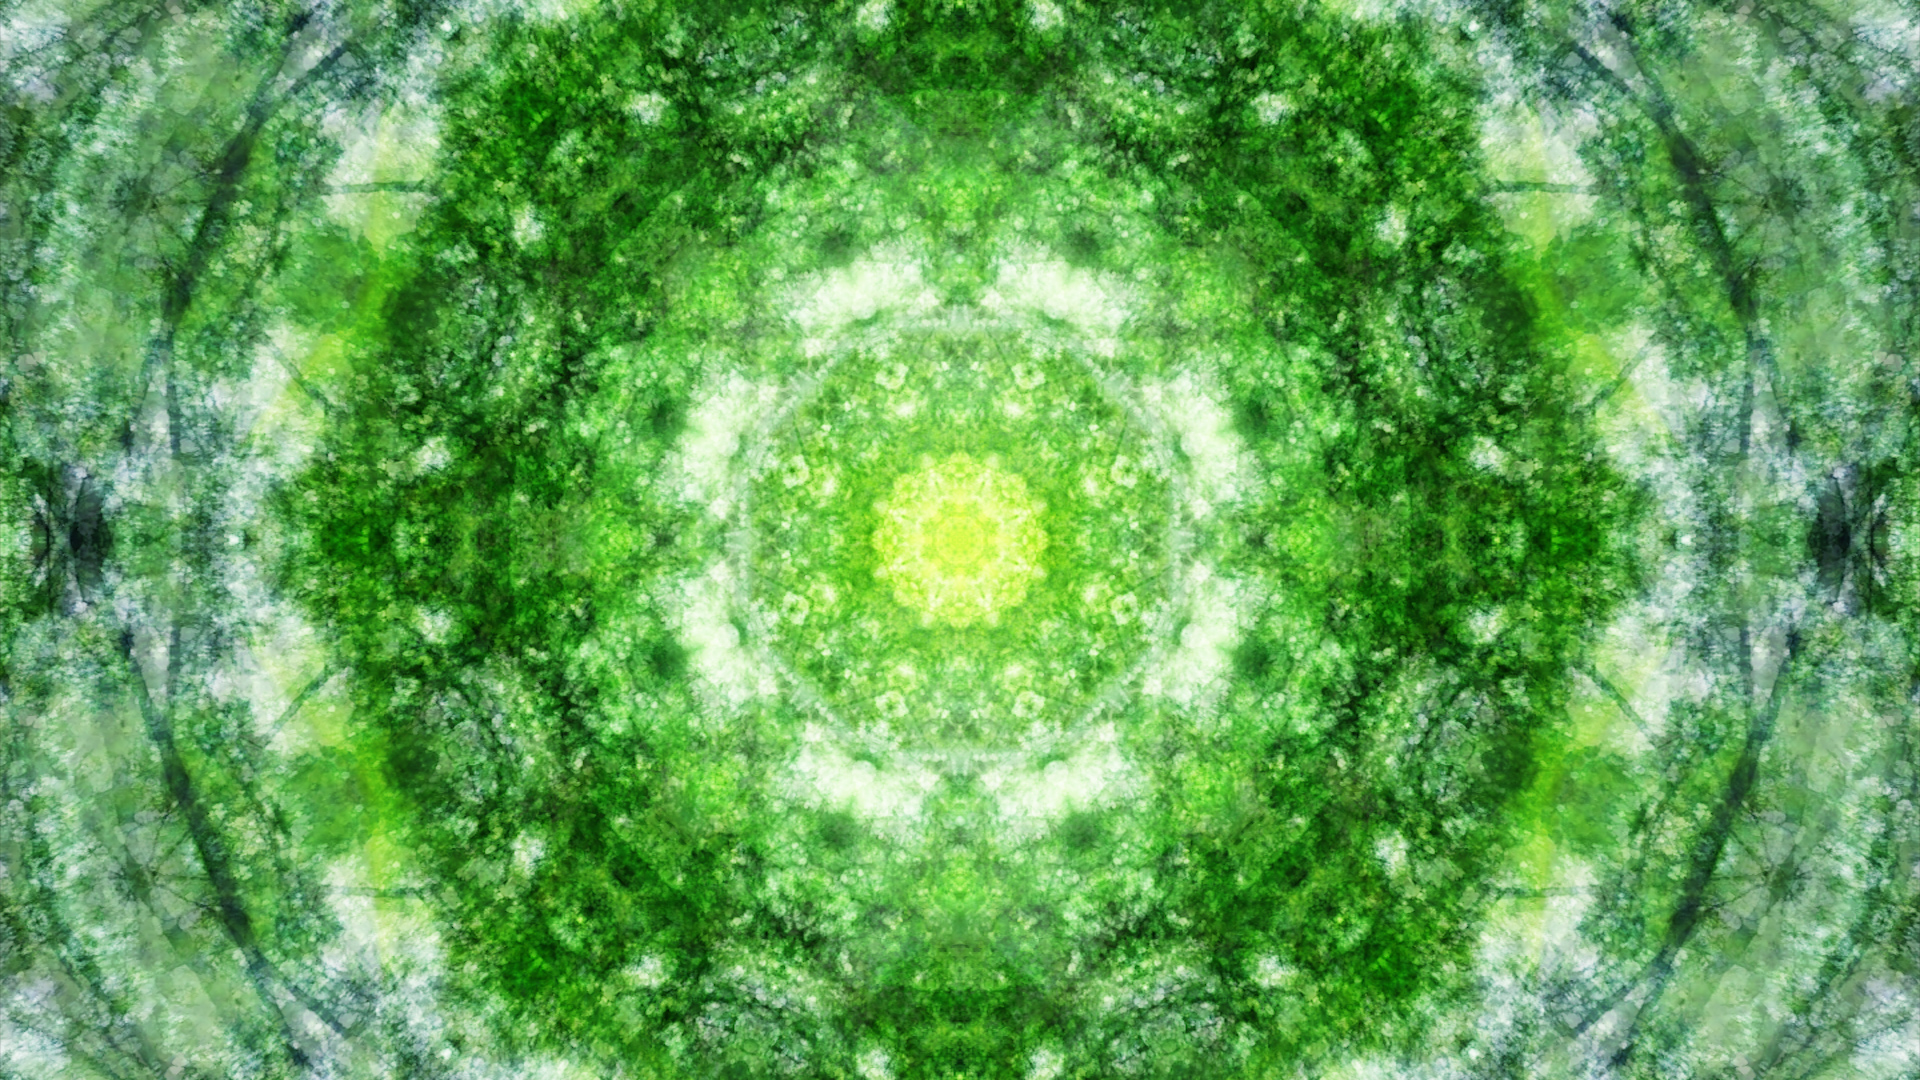 Emitting Velocity - Mohican Forest by Matt Swift Still 1